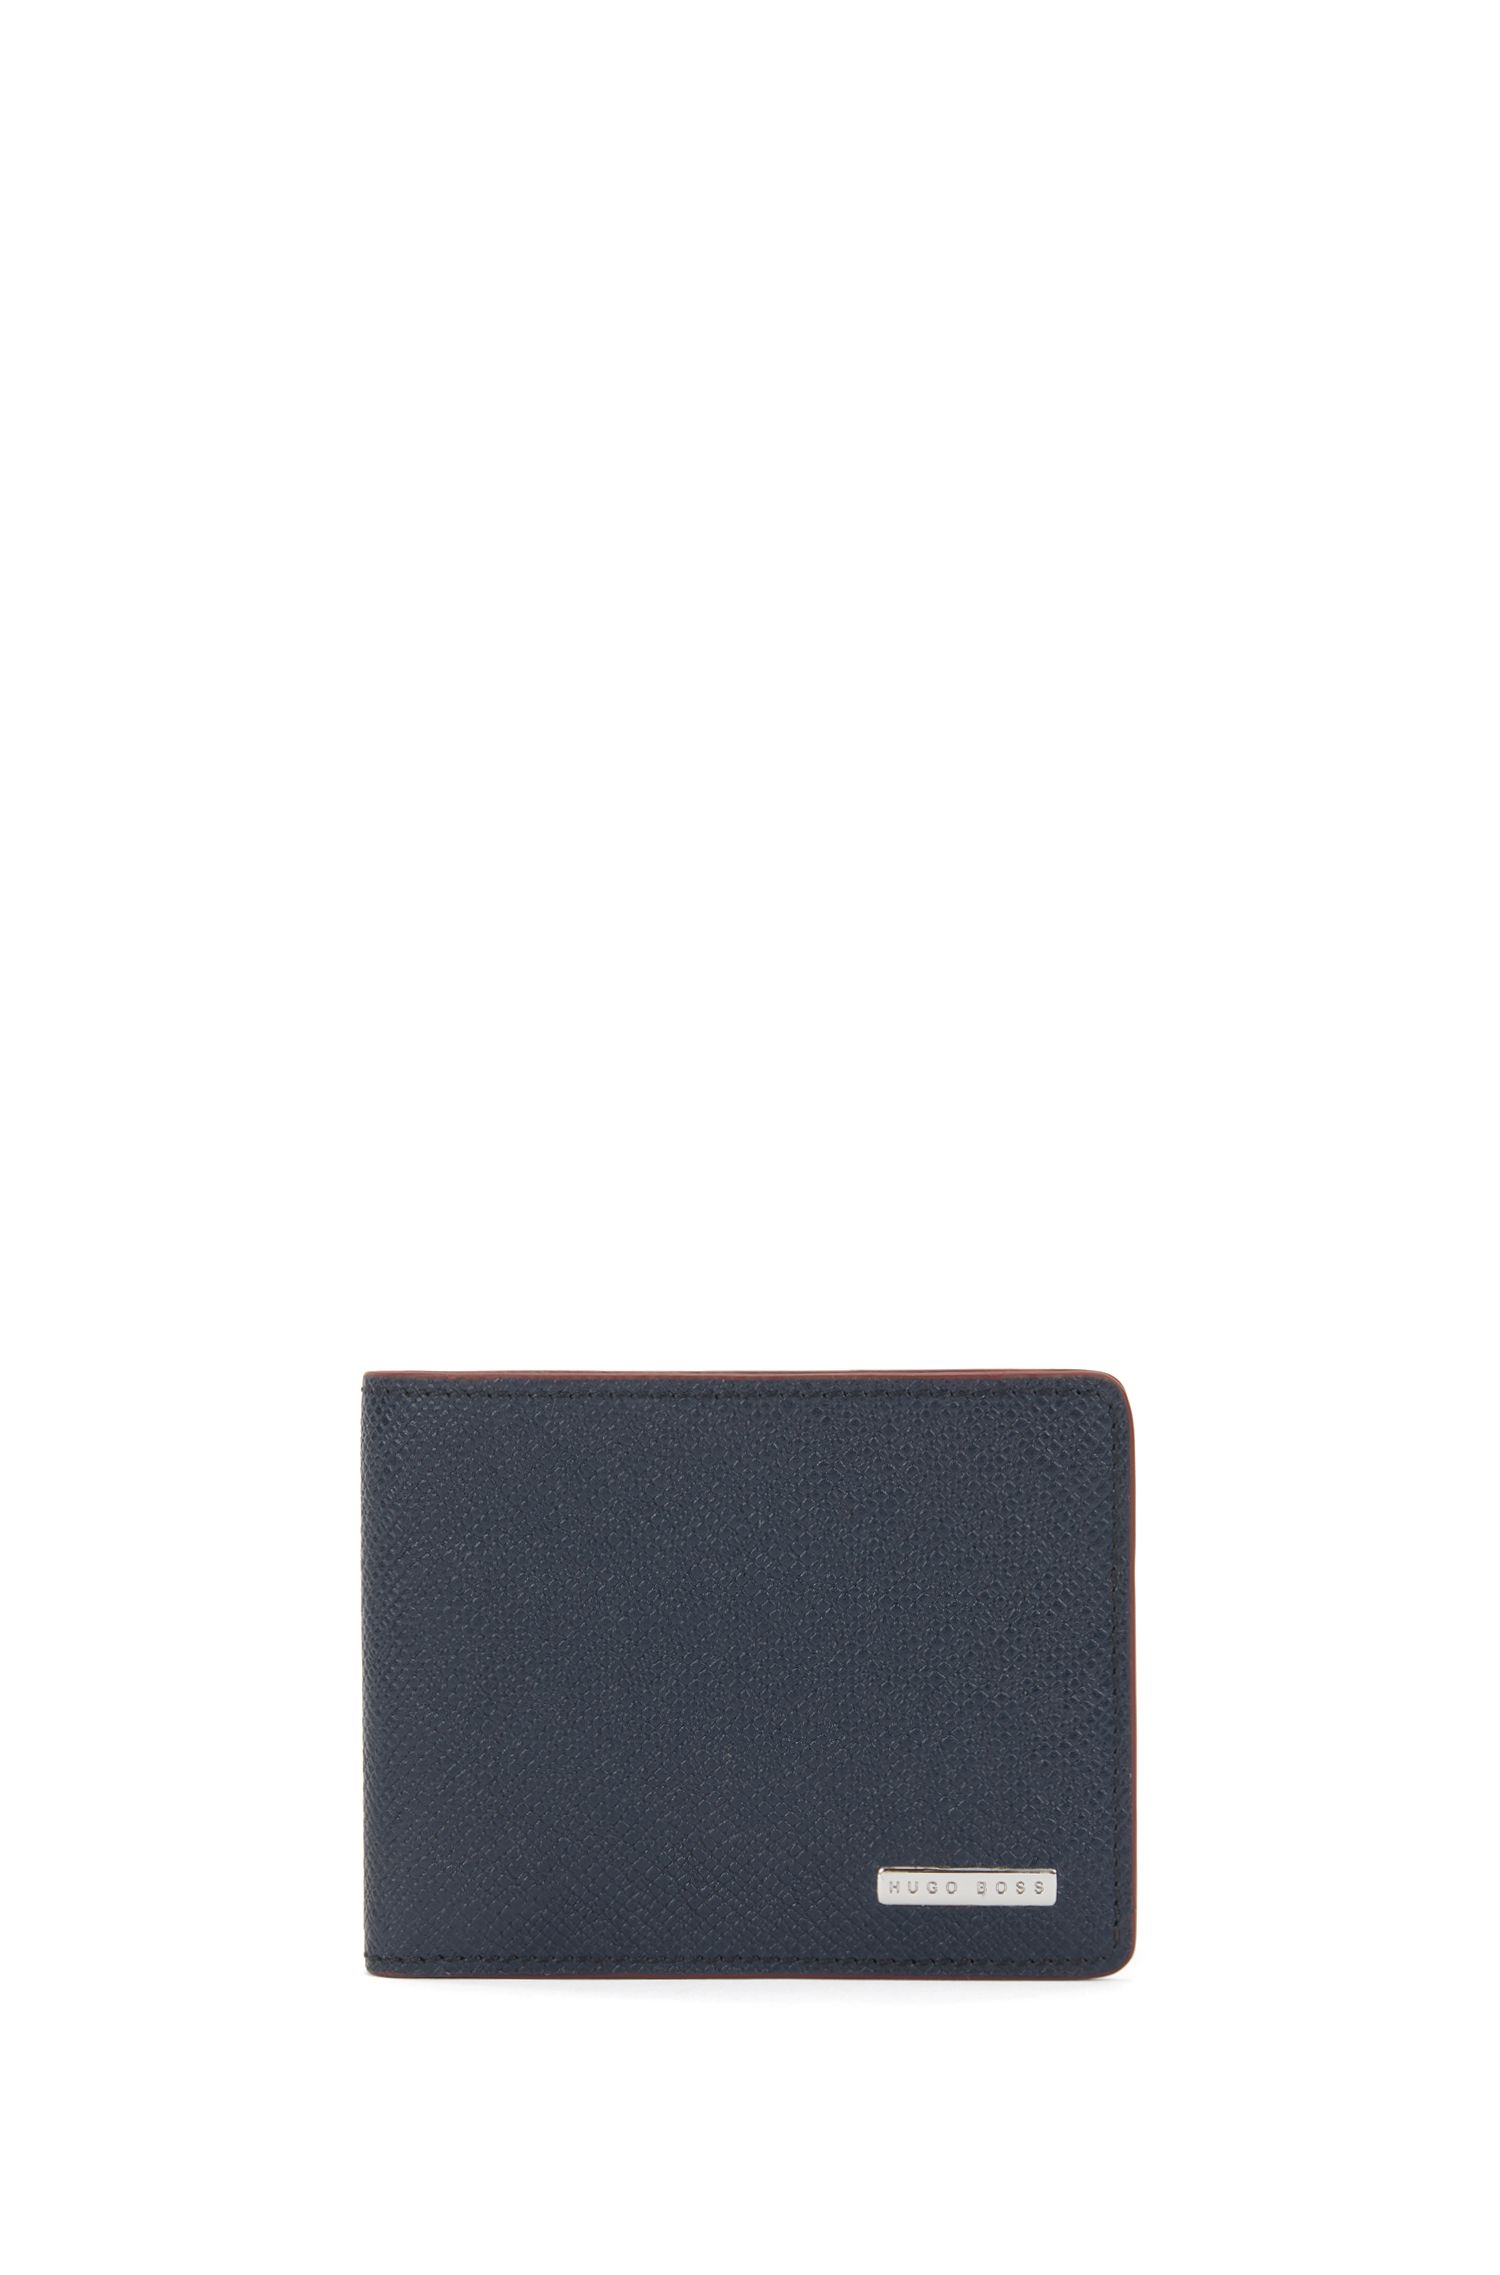 Signature Collection wallet in palmellato leather, Dark Blue